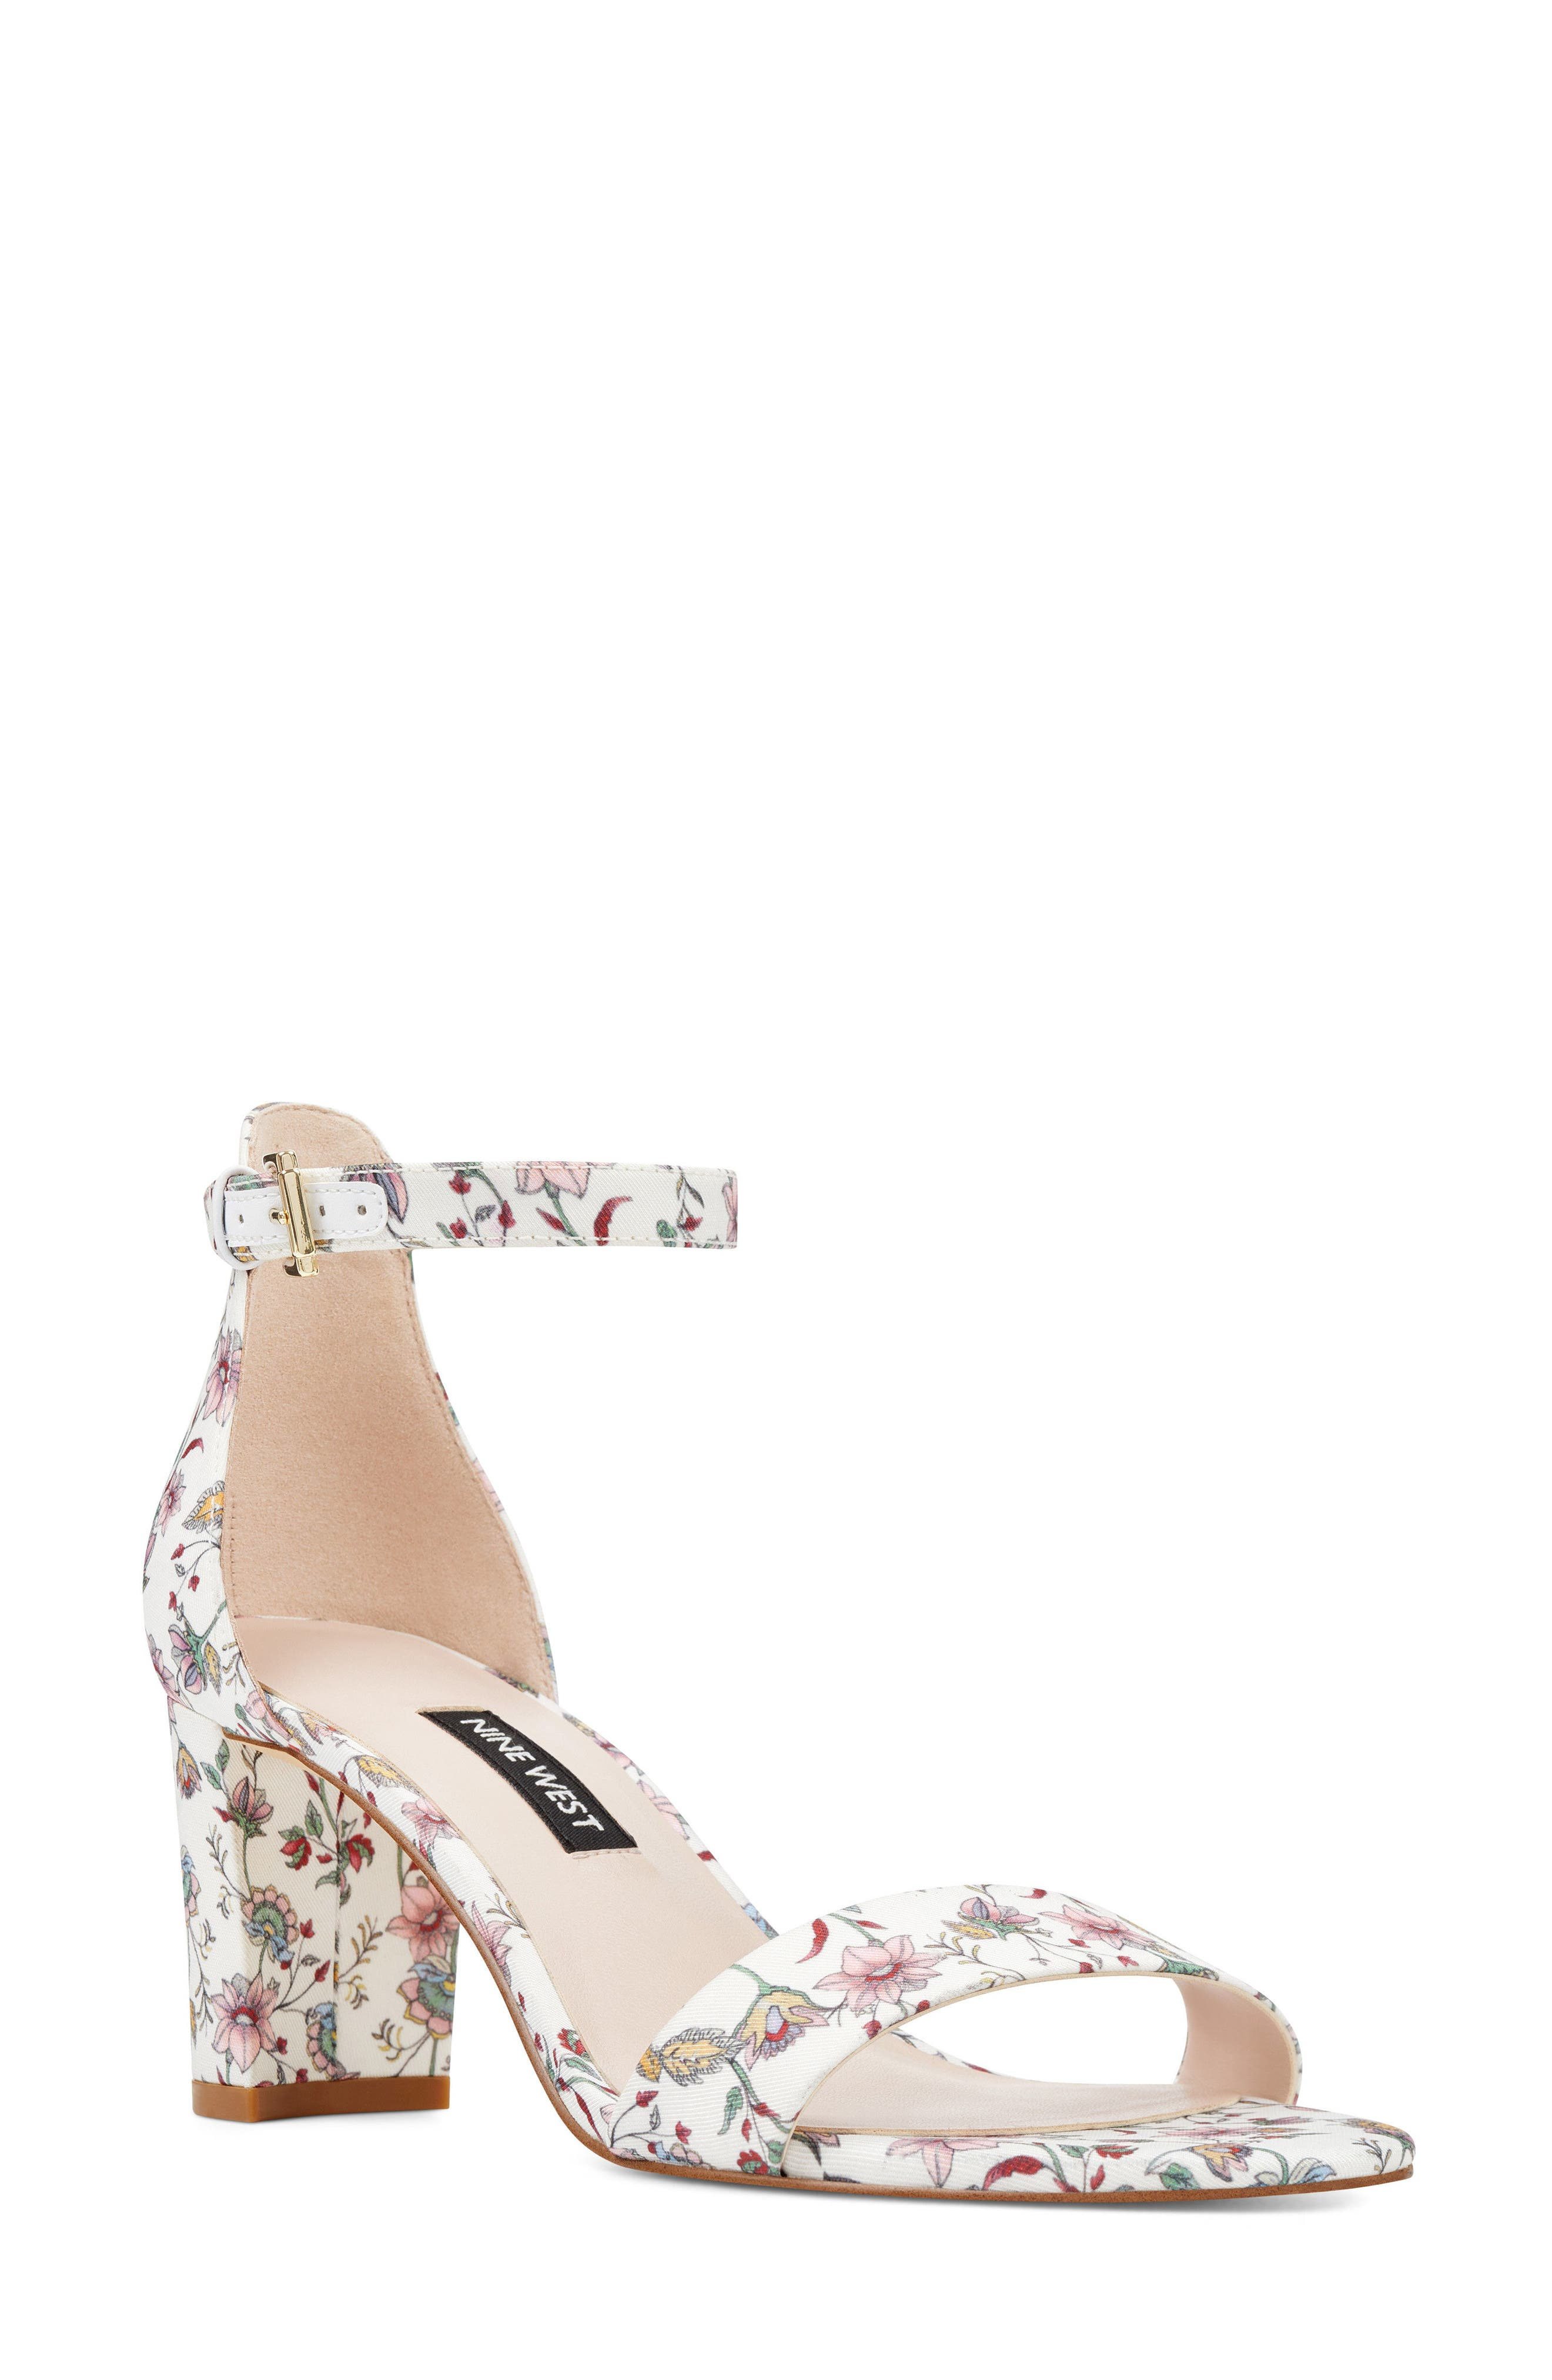 Pruce Ankle Strap Sandal,                         Main,                         color, White Multi